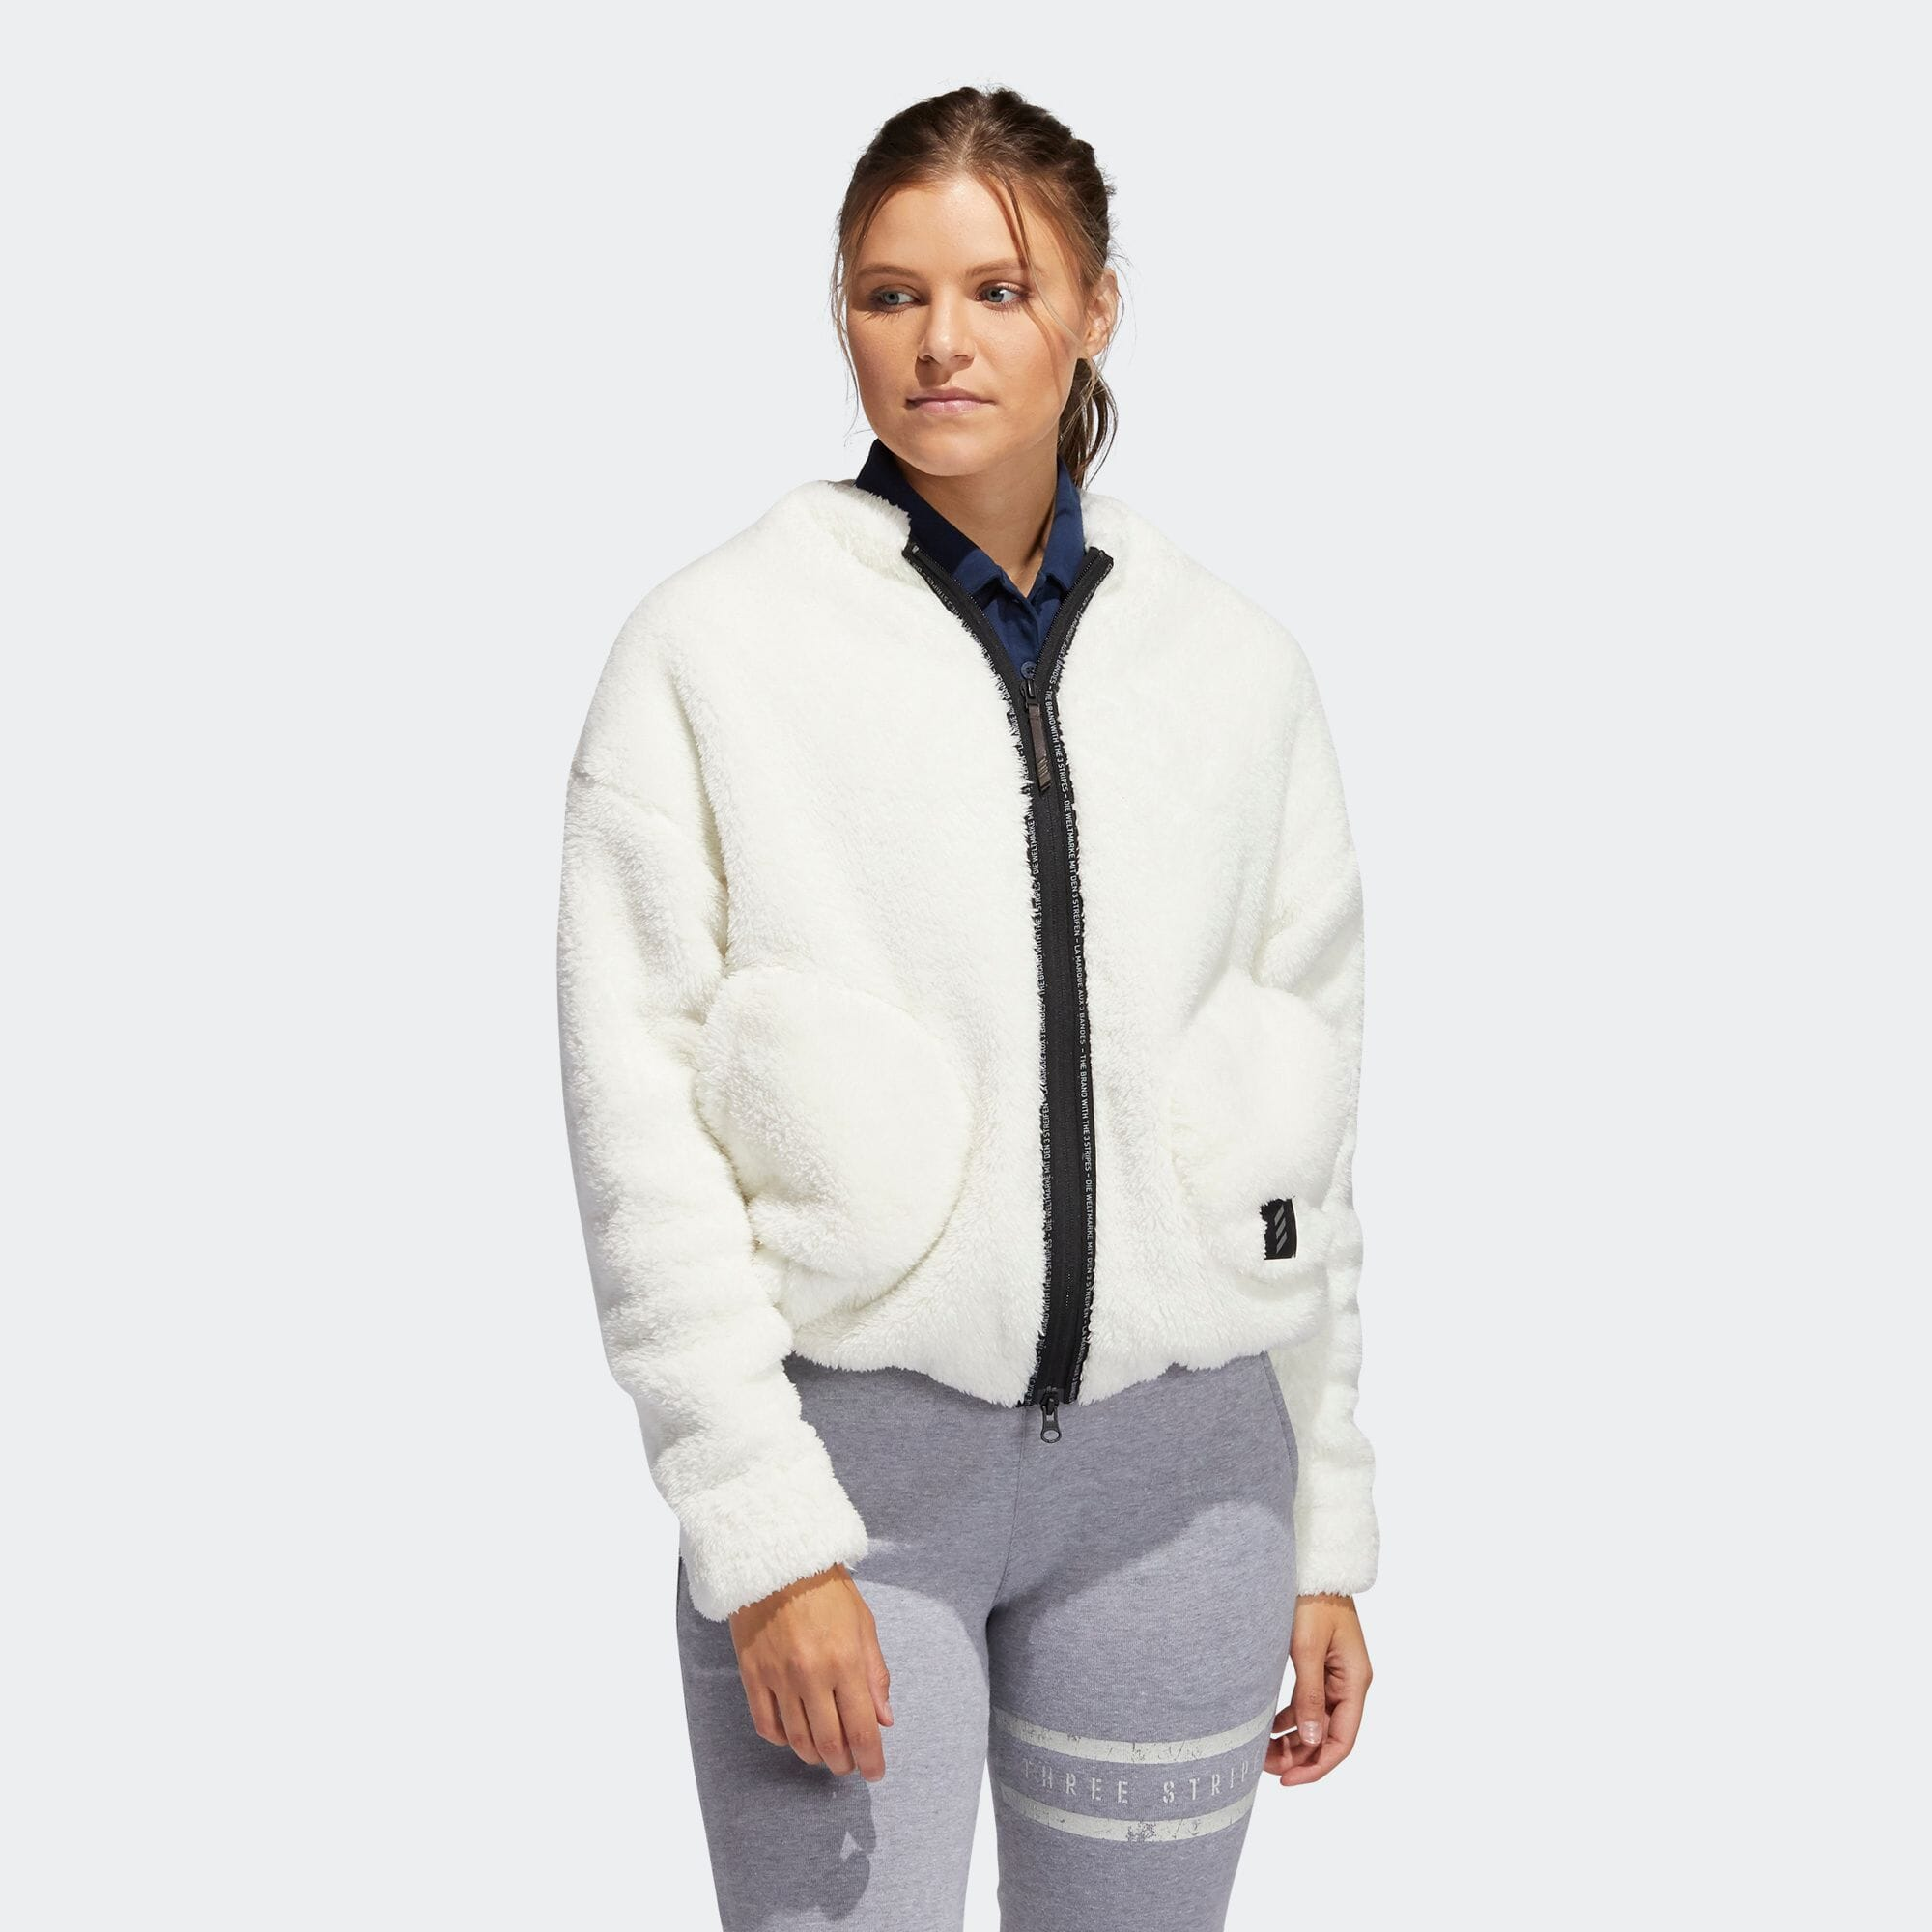 ADICROSS ボアフリース 長袖フルジップジャケット 【ゴルフ】/ Adicross Jacket